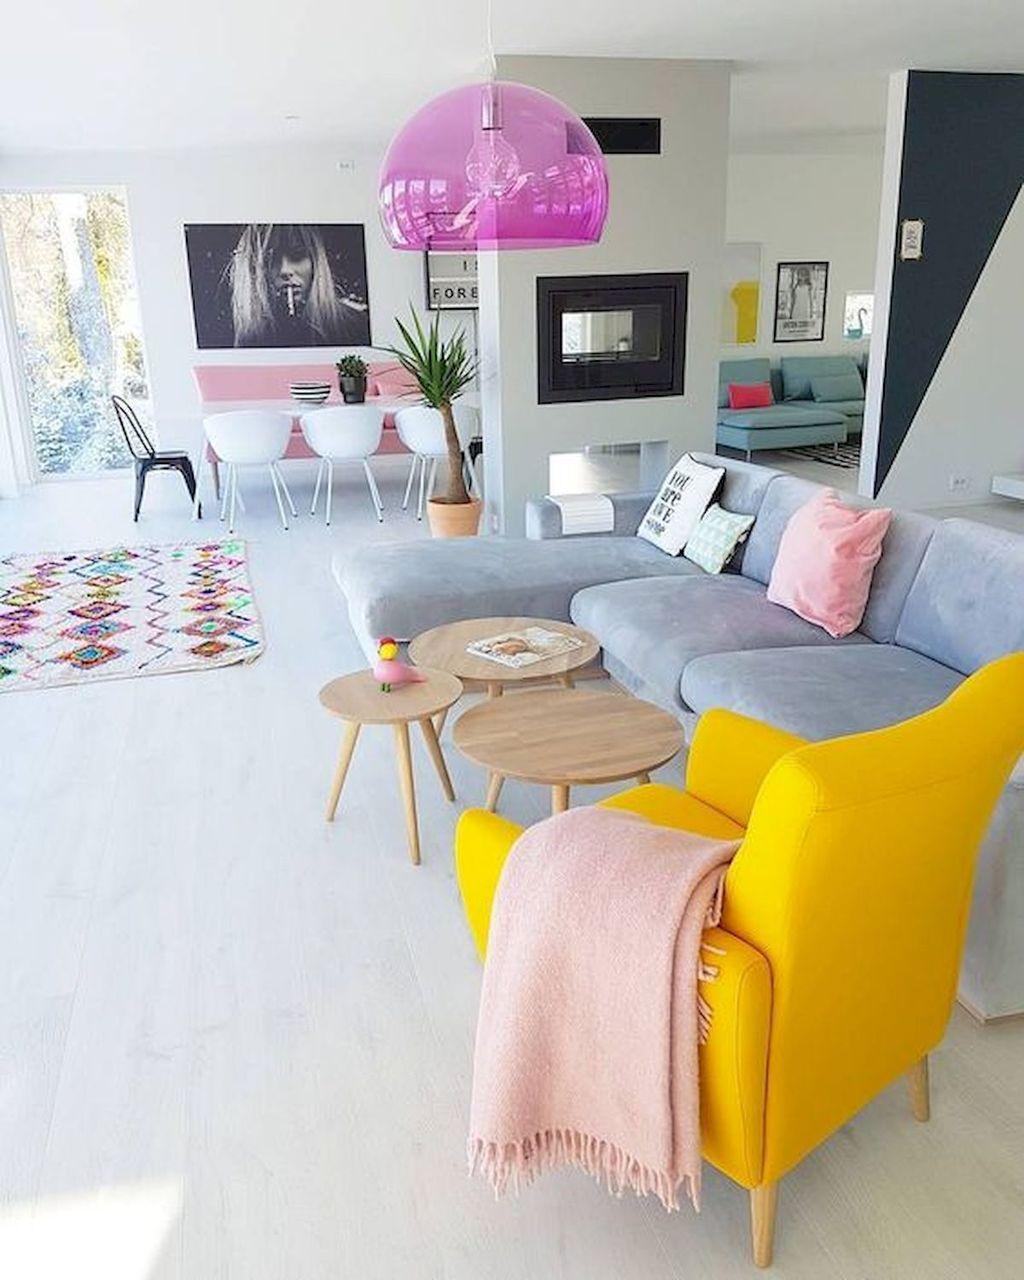 Fabulous Colorful Apartment Decor Ideas 05